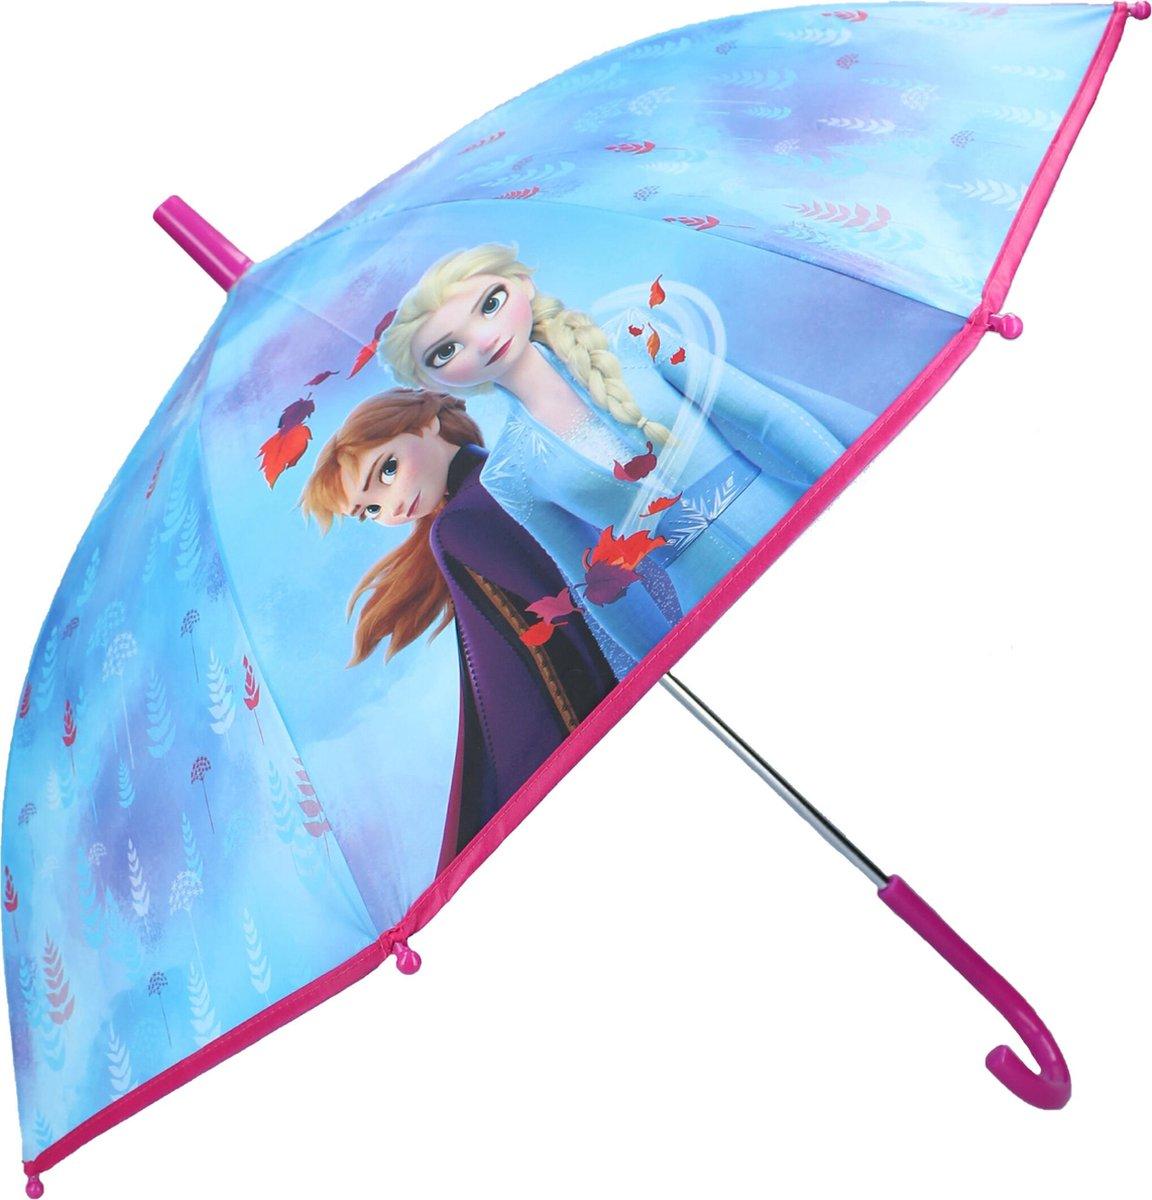 Disney Frozen II Don't Worry About Rain Paraplu - 63 x 70 x 70 cm - Blauw